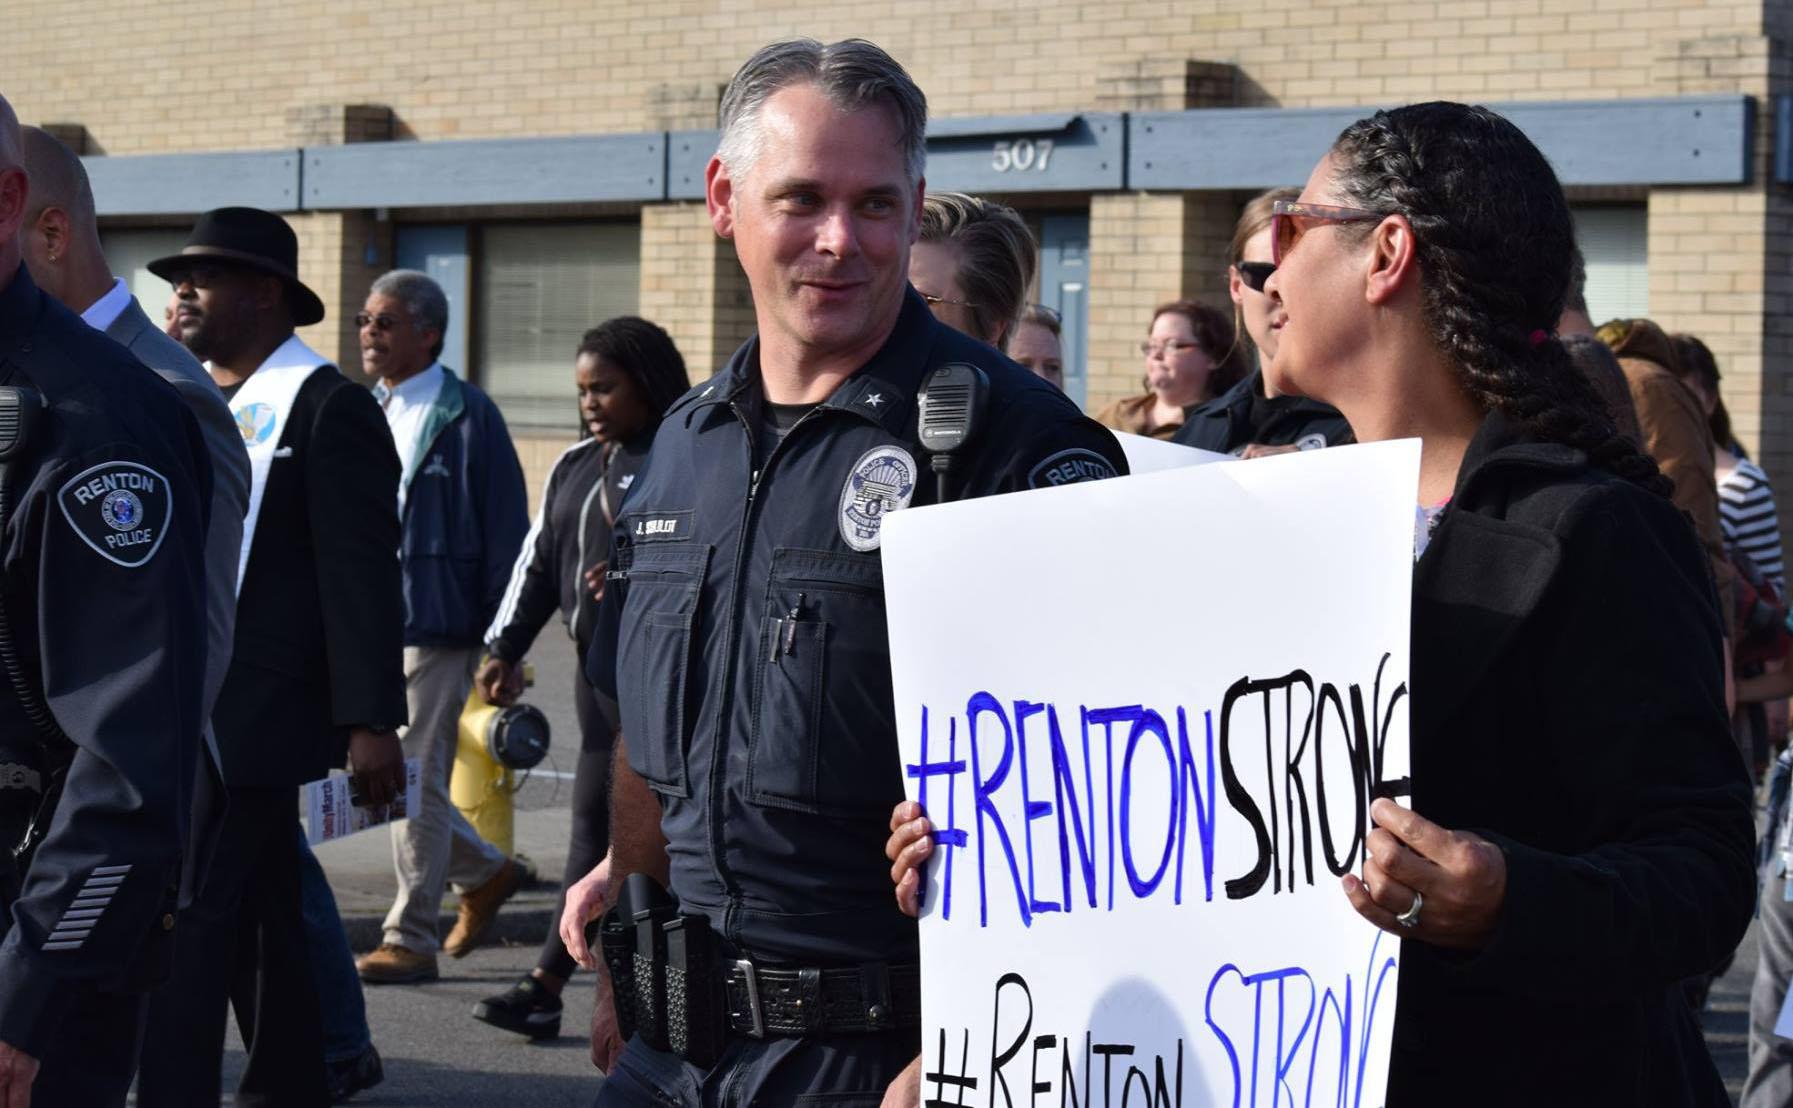 Renton City Hall Police Department